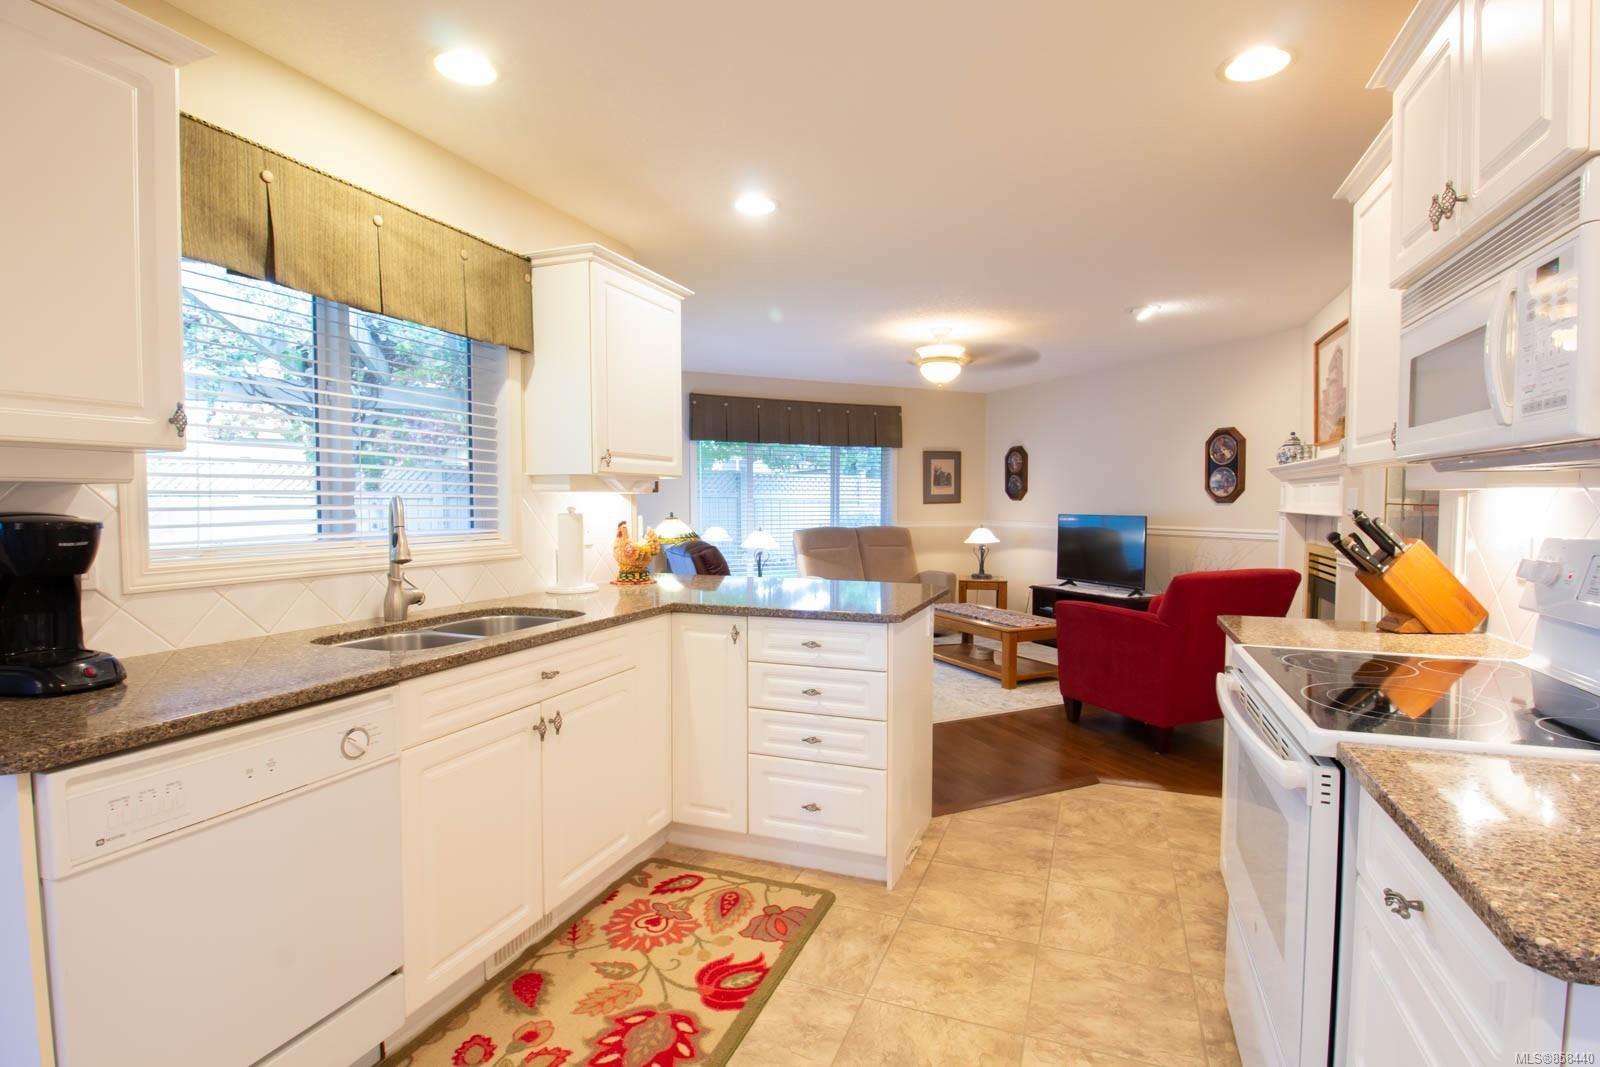 Photo 15: Photos: 798 Devon Pl in : PQ Qualicum Beach House for sale (Parksville/Qualicum)  : MLS®# 858440